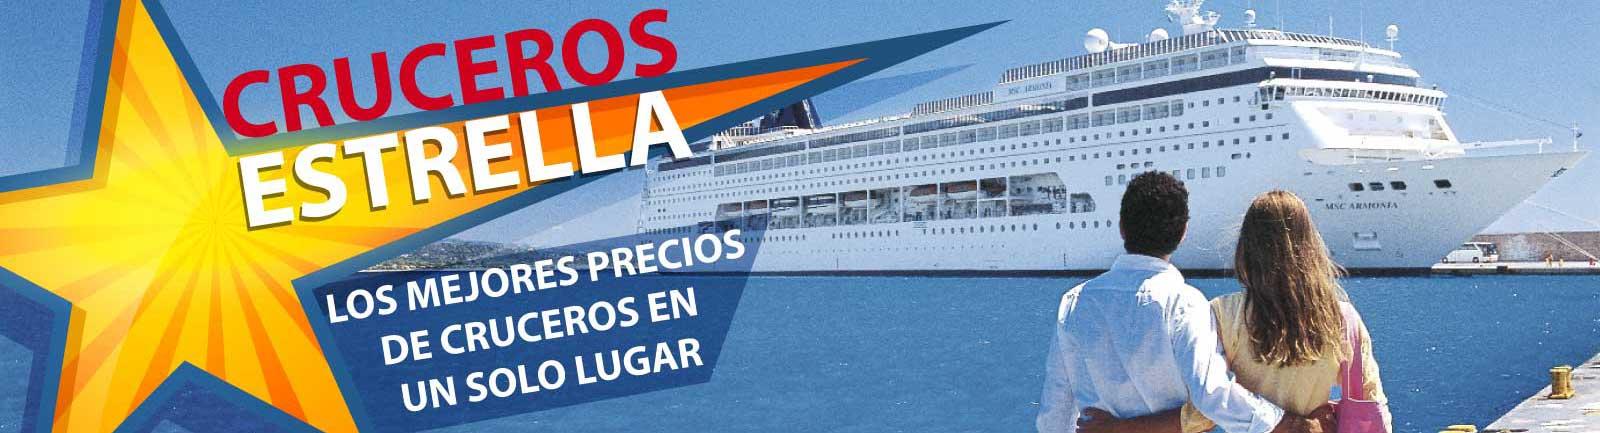 Crucero Cruceros ESTRELLA